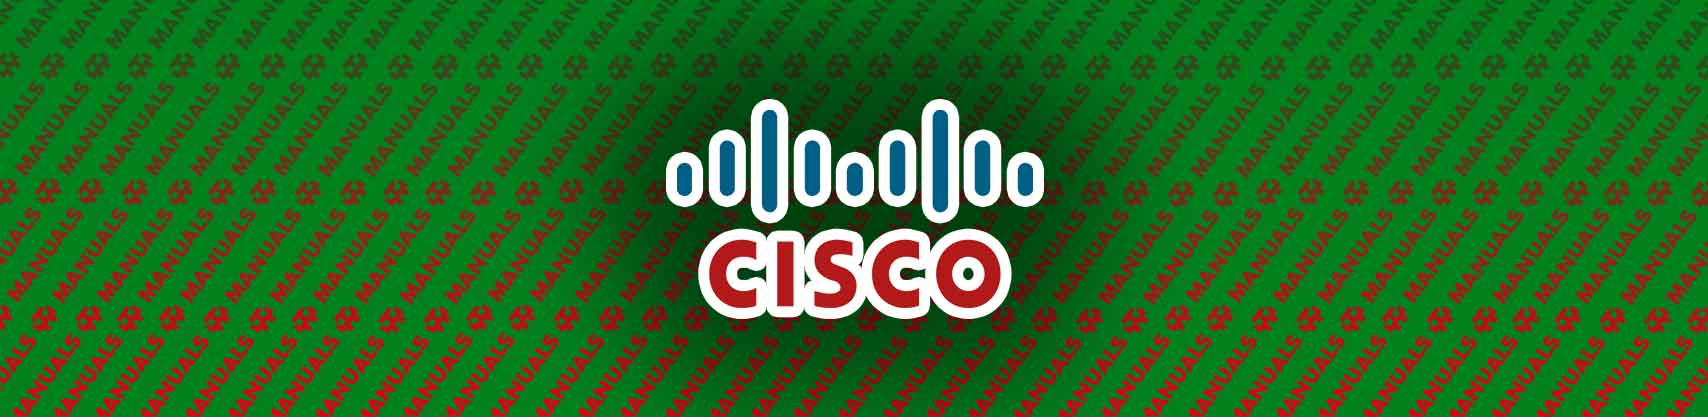 Cisco SX20 Manual